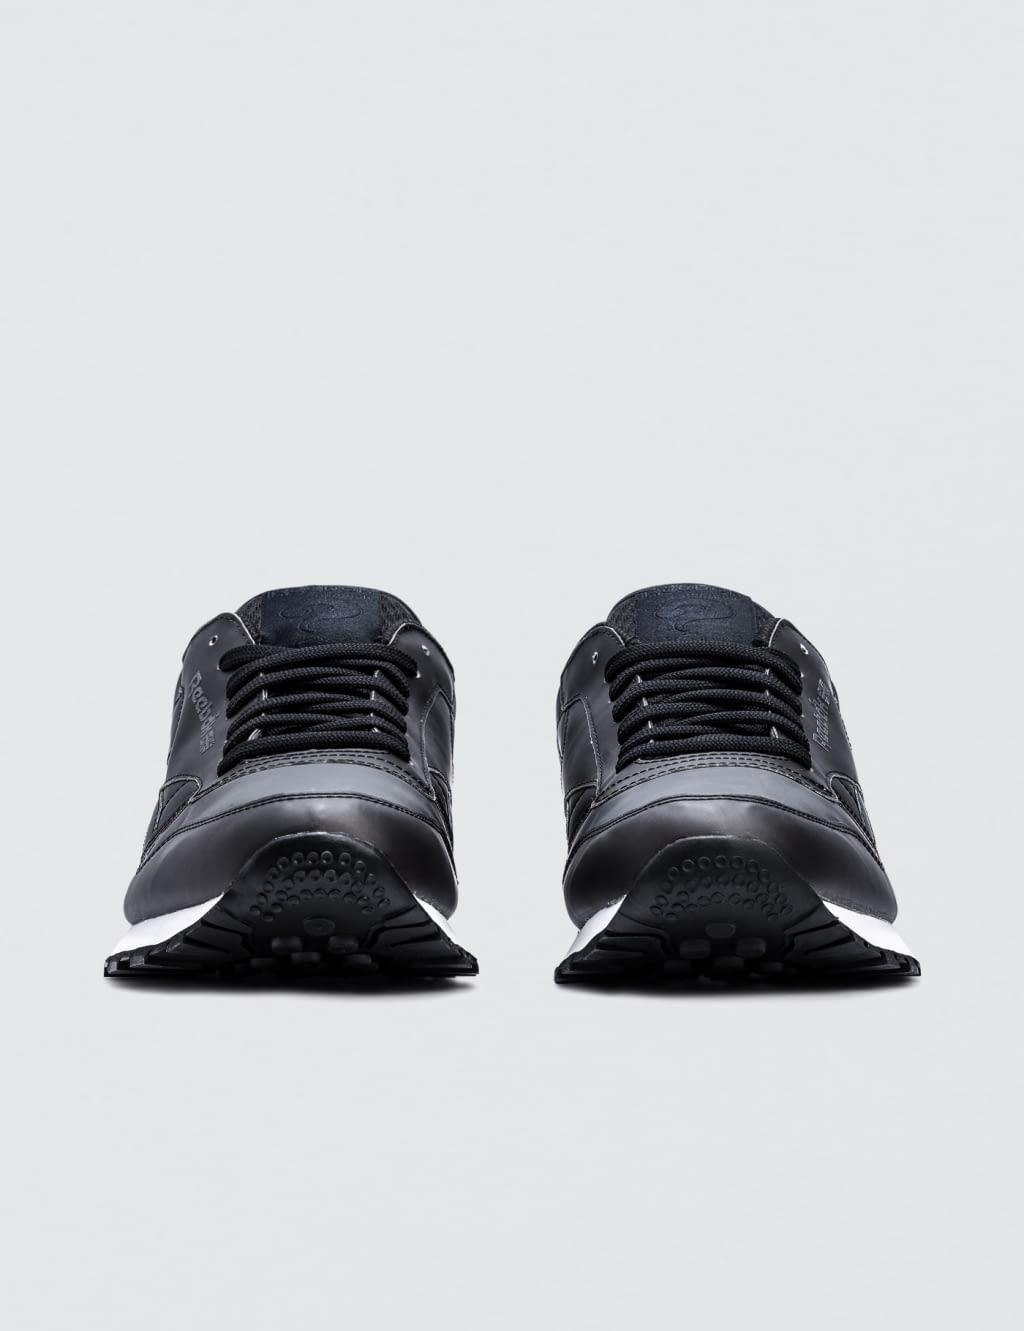 Jual Reebok Cl Leather Af 100 Original Bobobobo Atsthelabel Eeva Black Top